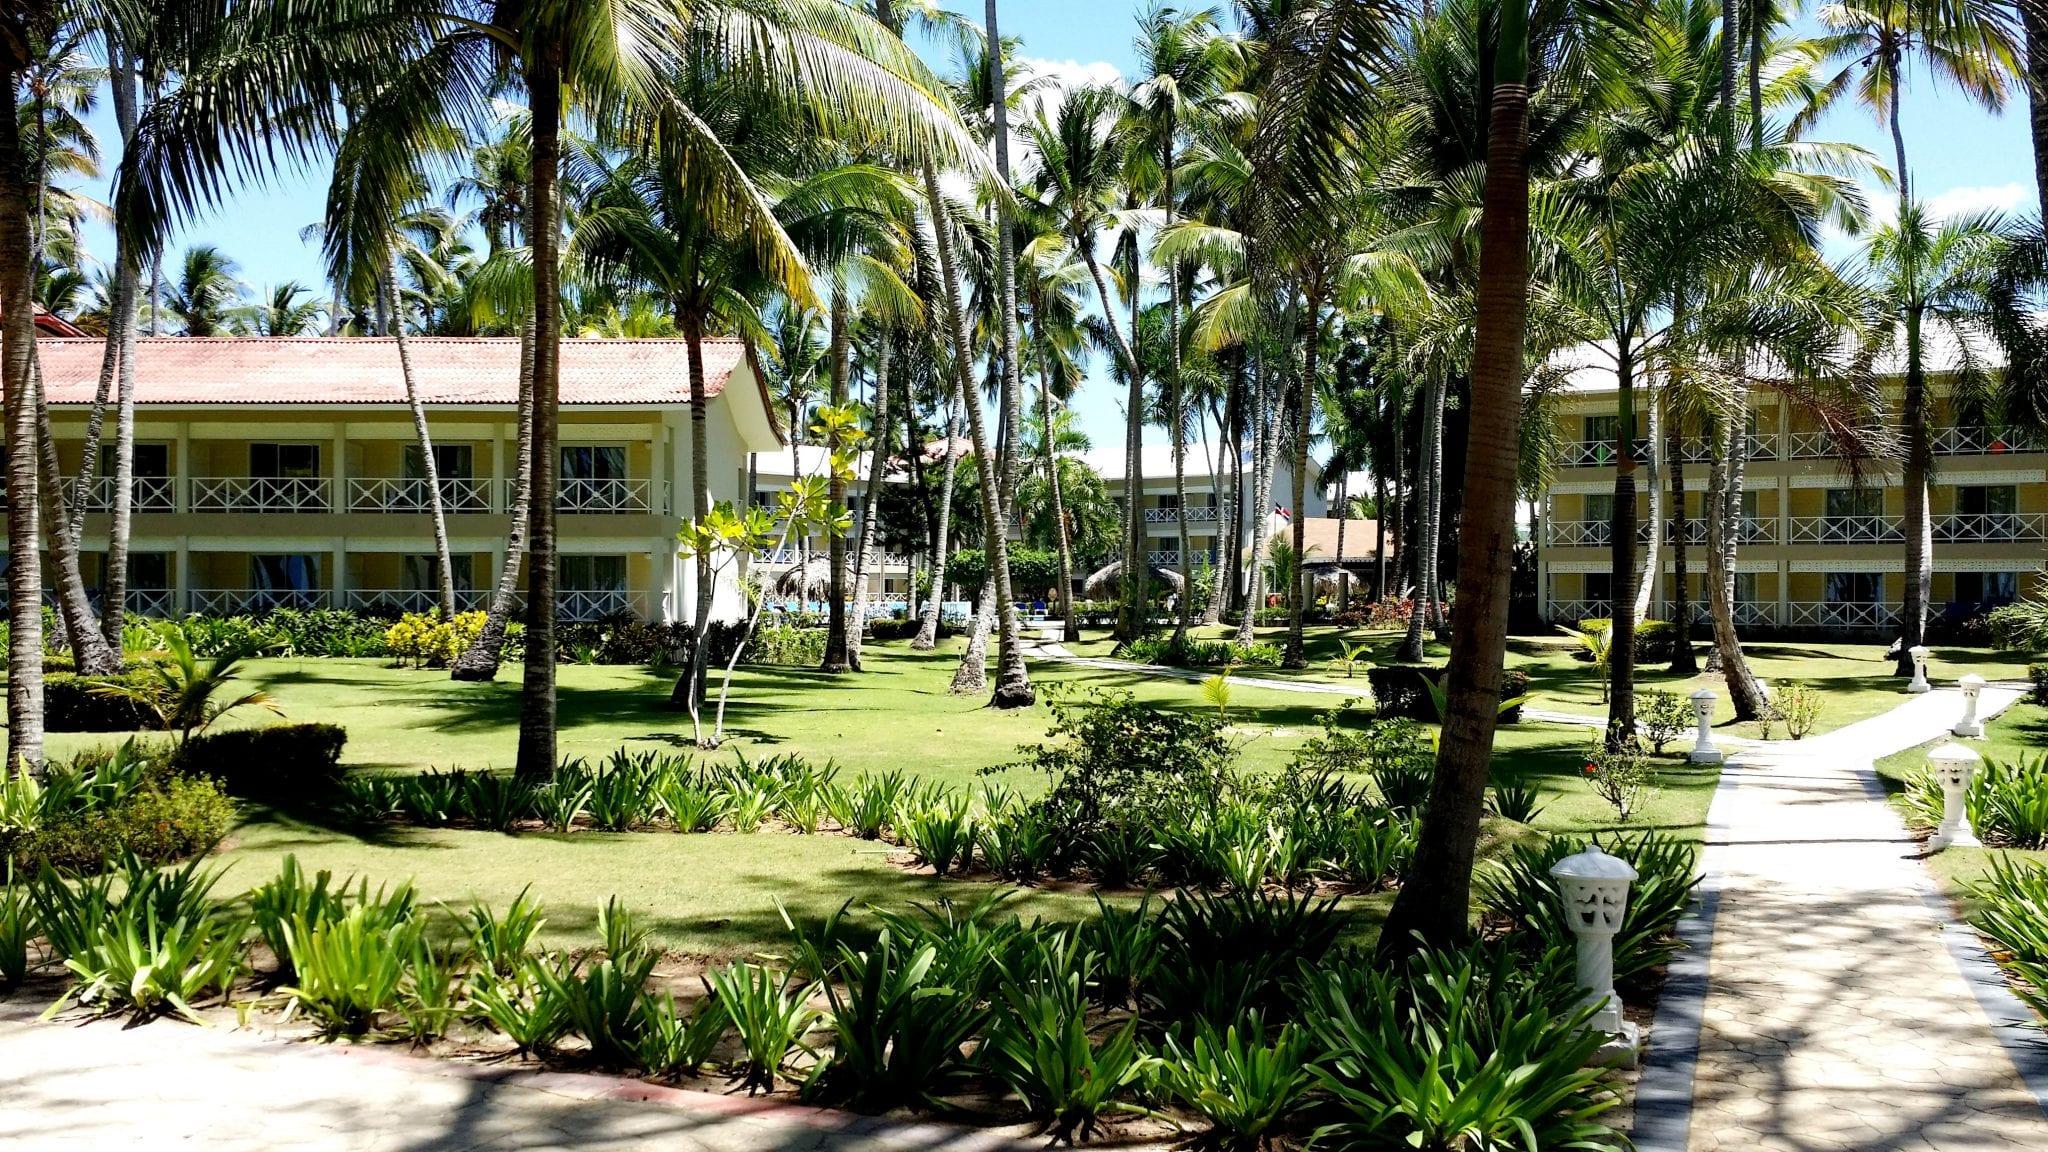 Anlage Hotel Vista Sol Punta Cana